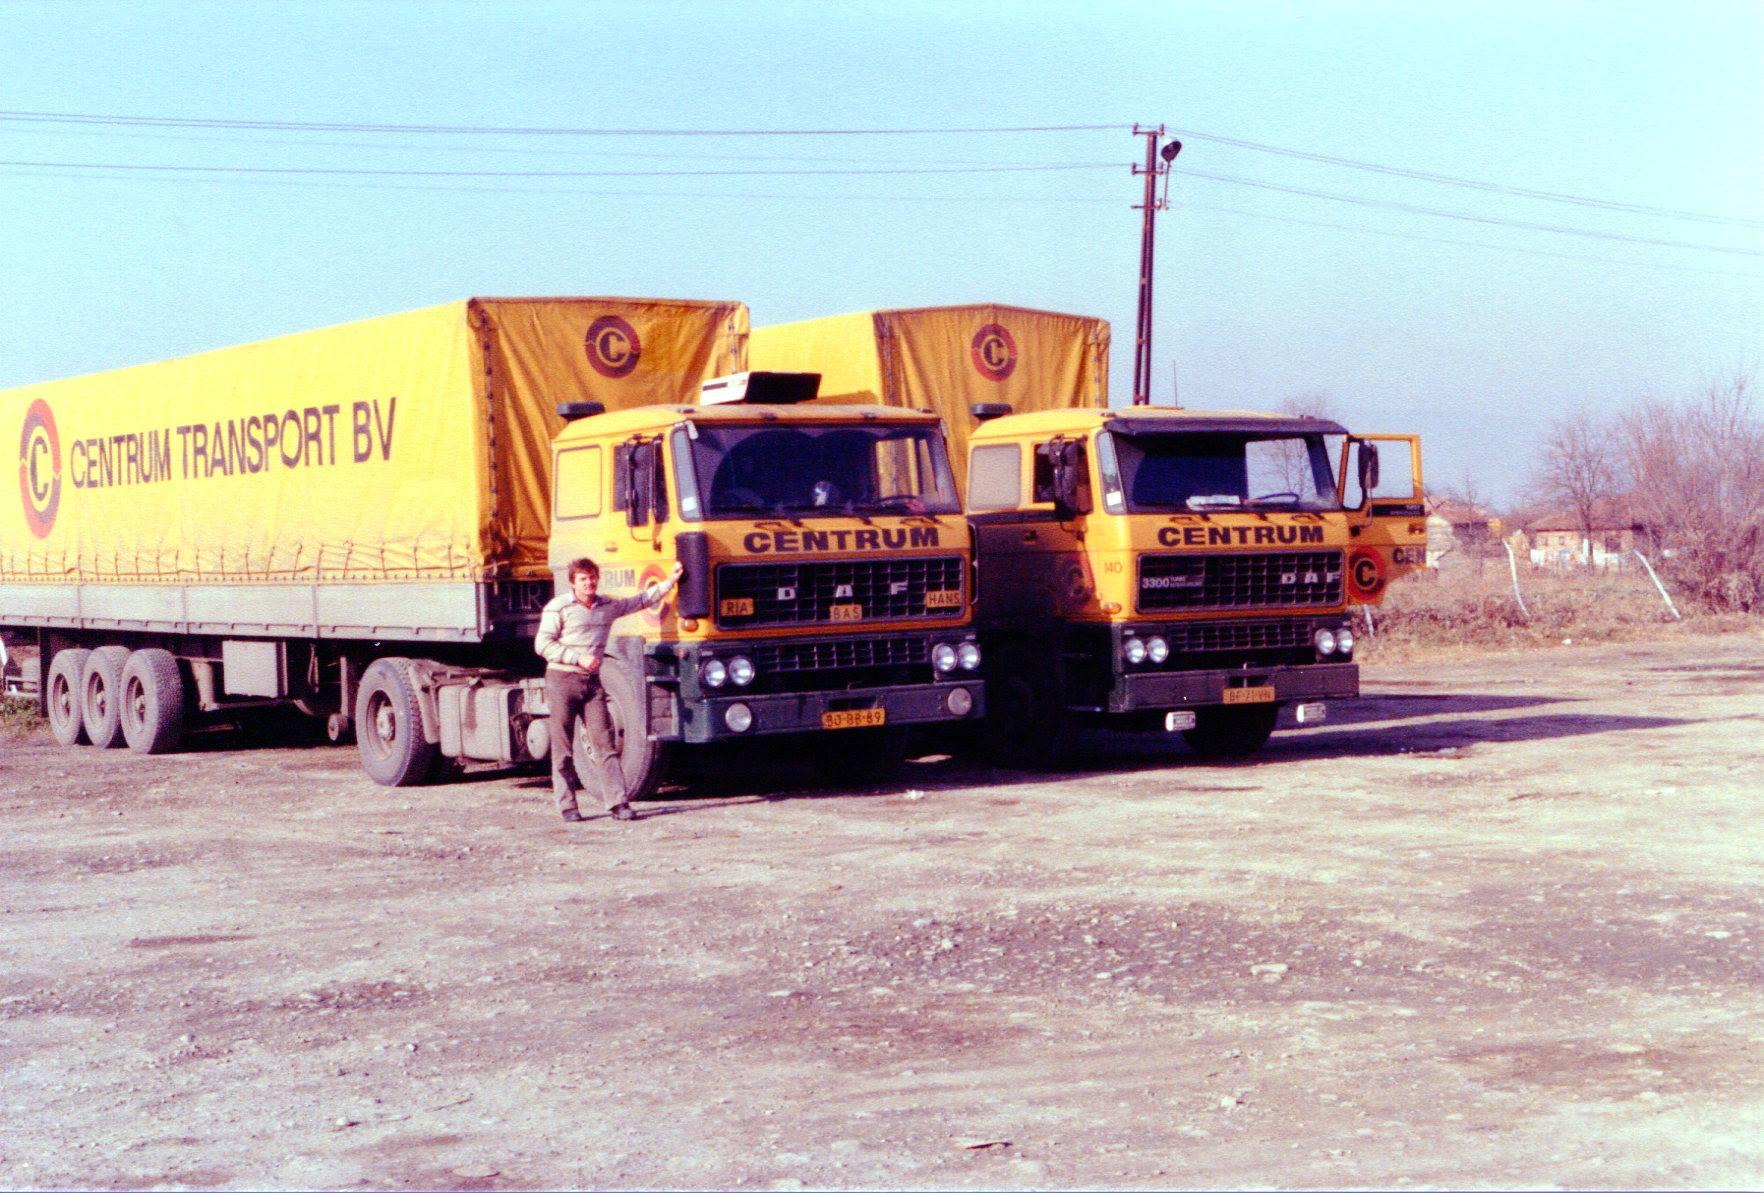 Hans-Anthonise-midden-oosten-transport-25